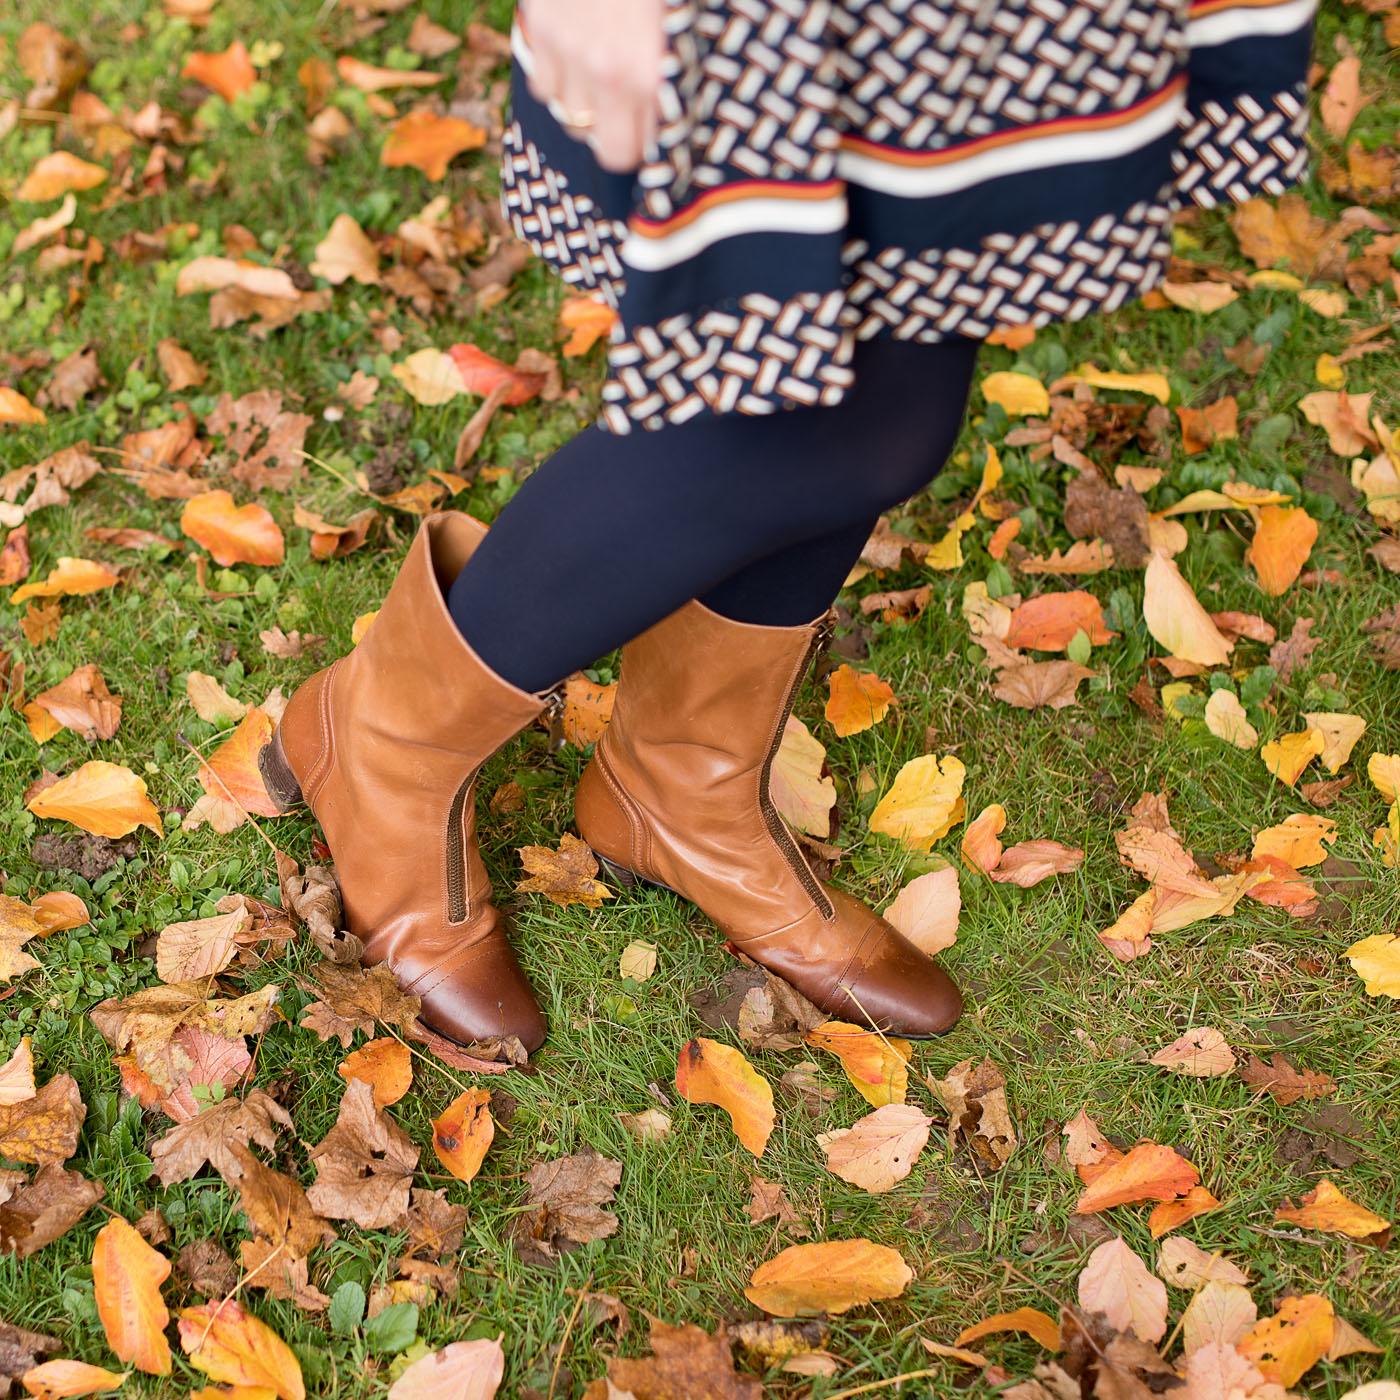 tommy-hilfiger-kleid-dress-zara-bag-booties-fall-fashion-fashionblog-8